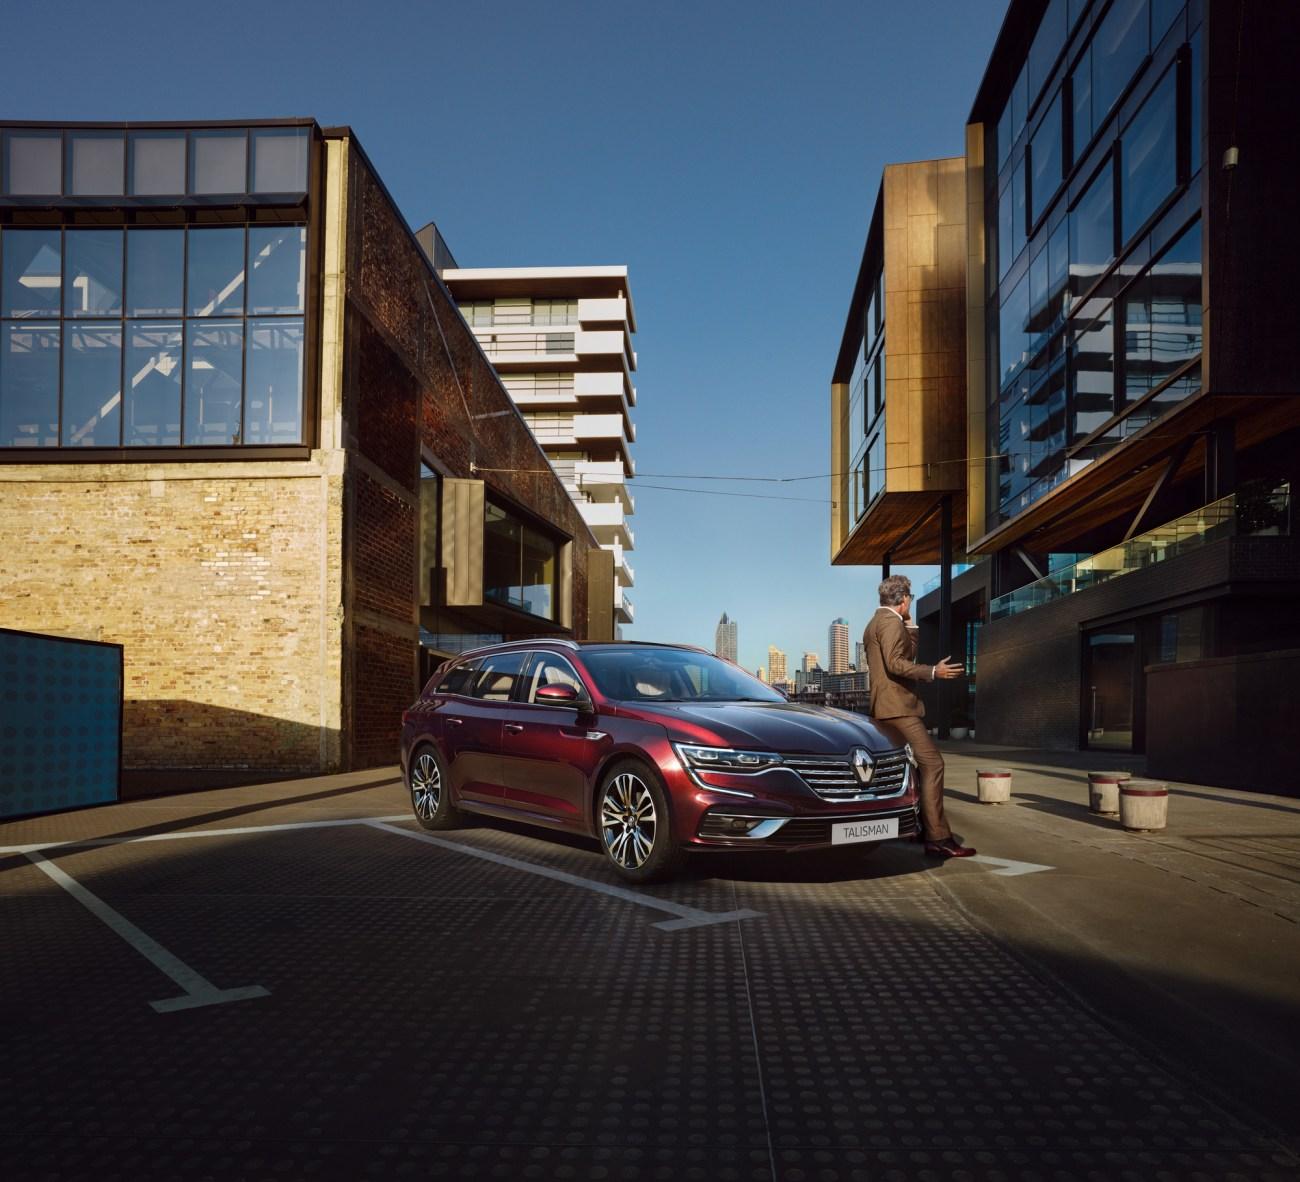 2020 - New Renault TALISMAN ESTATE5